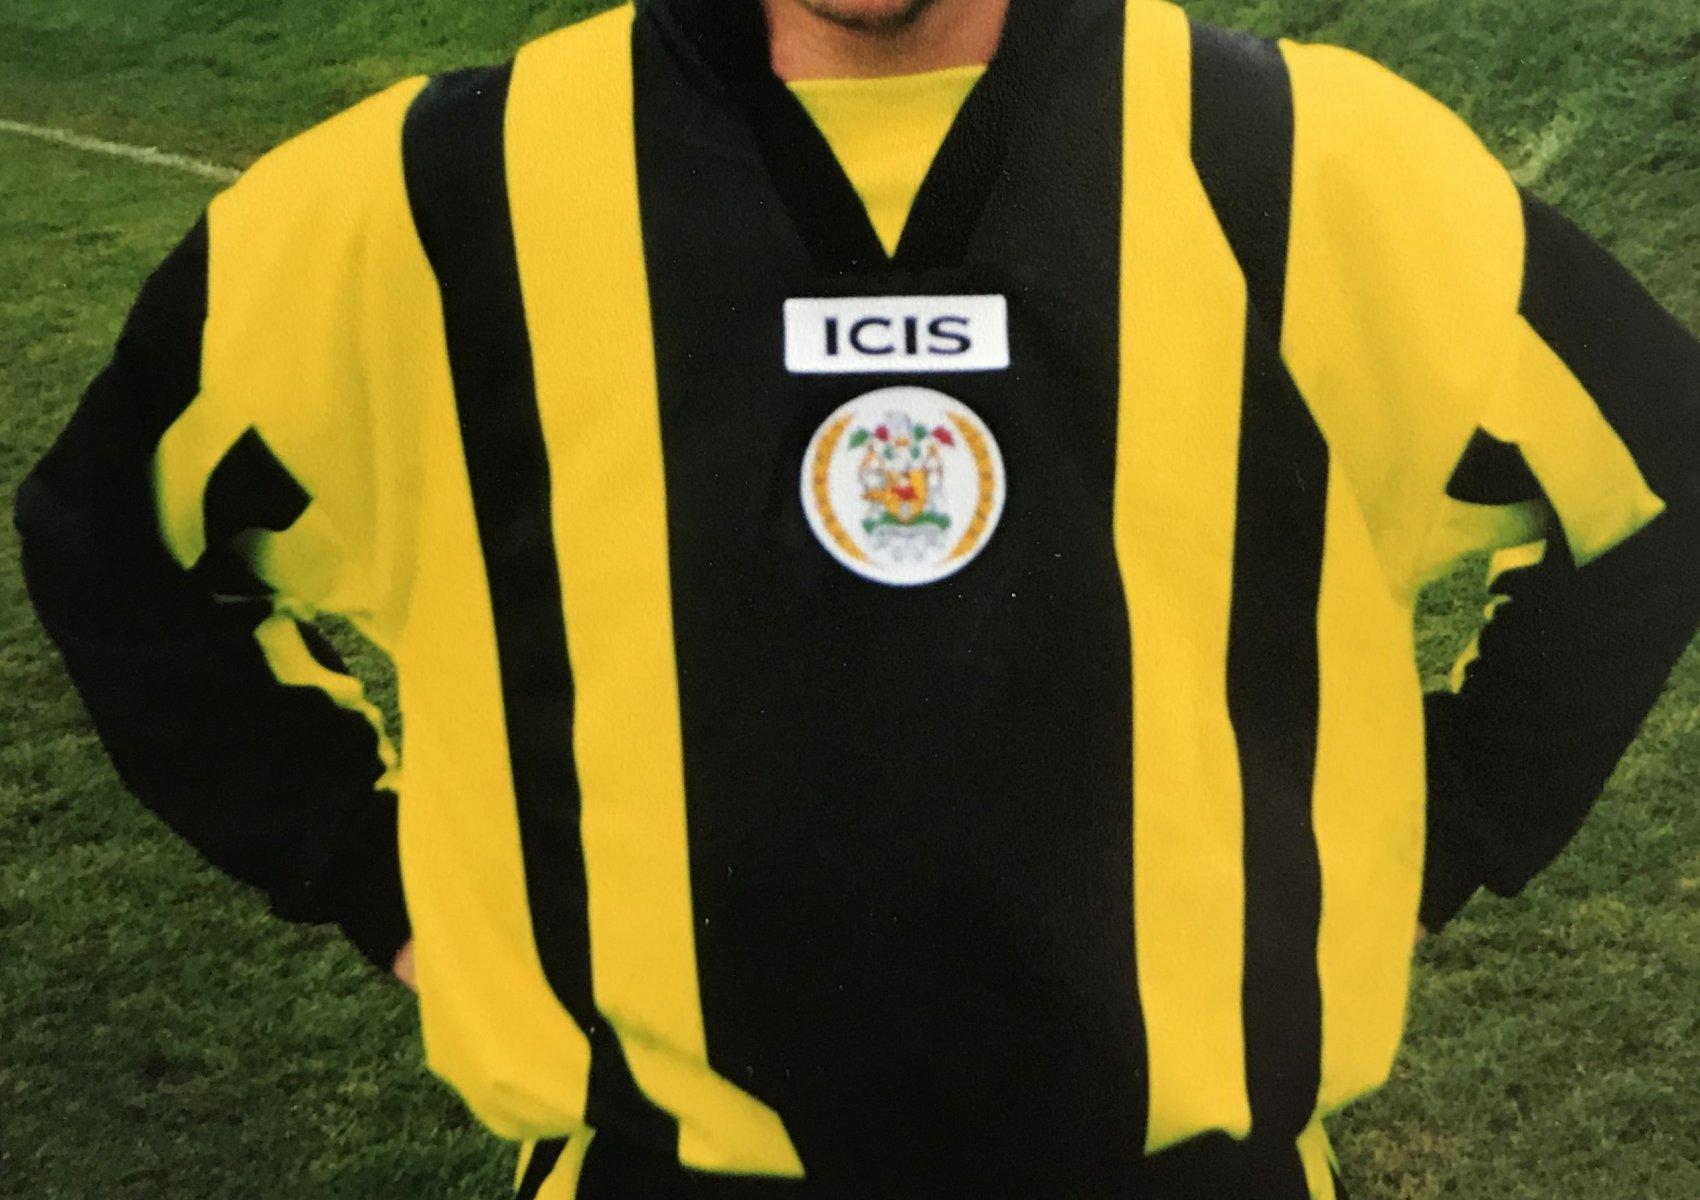 1998-99 Away (ICIS)